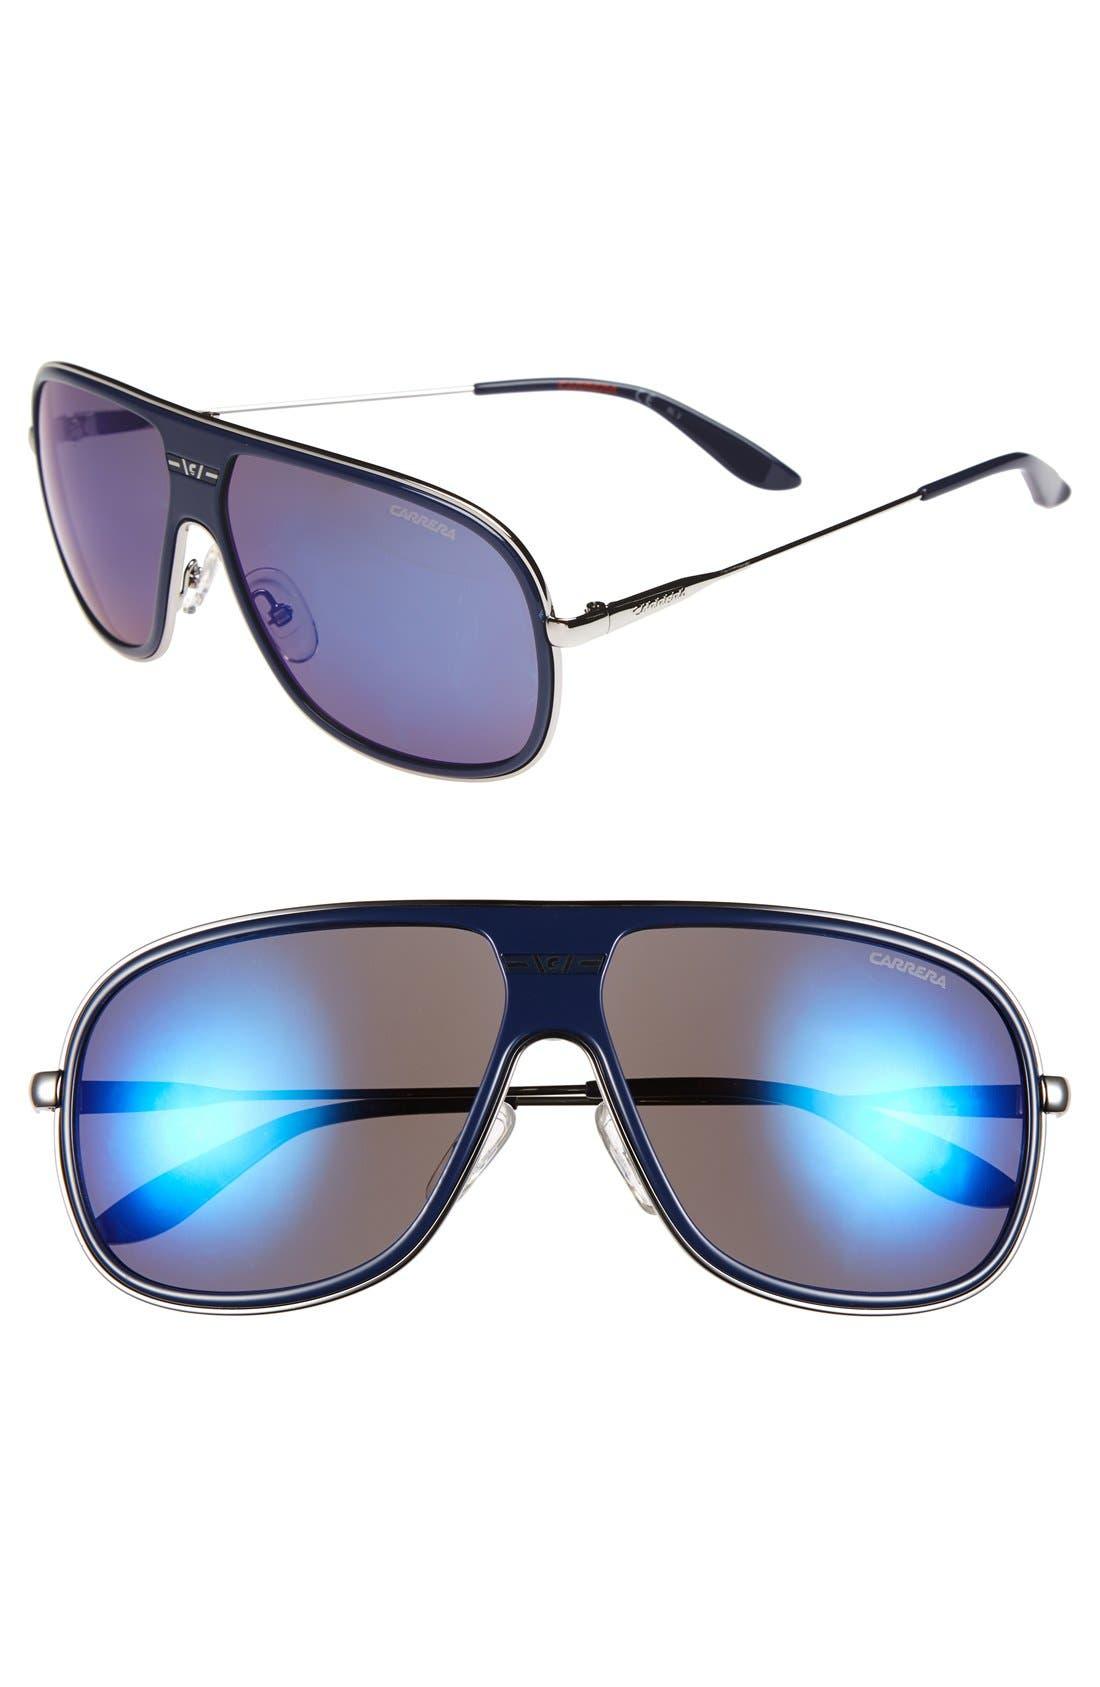 62mm Aviator Sunglasses,                         Main,                         color, 400